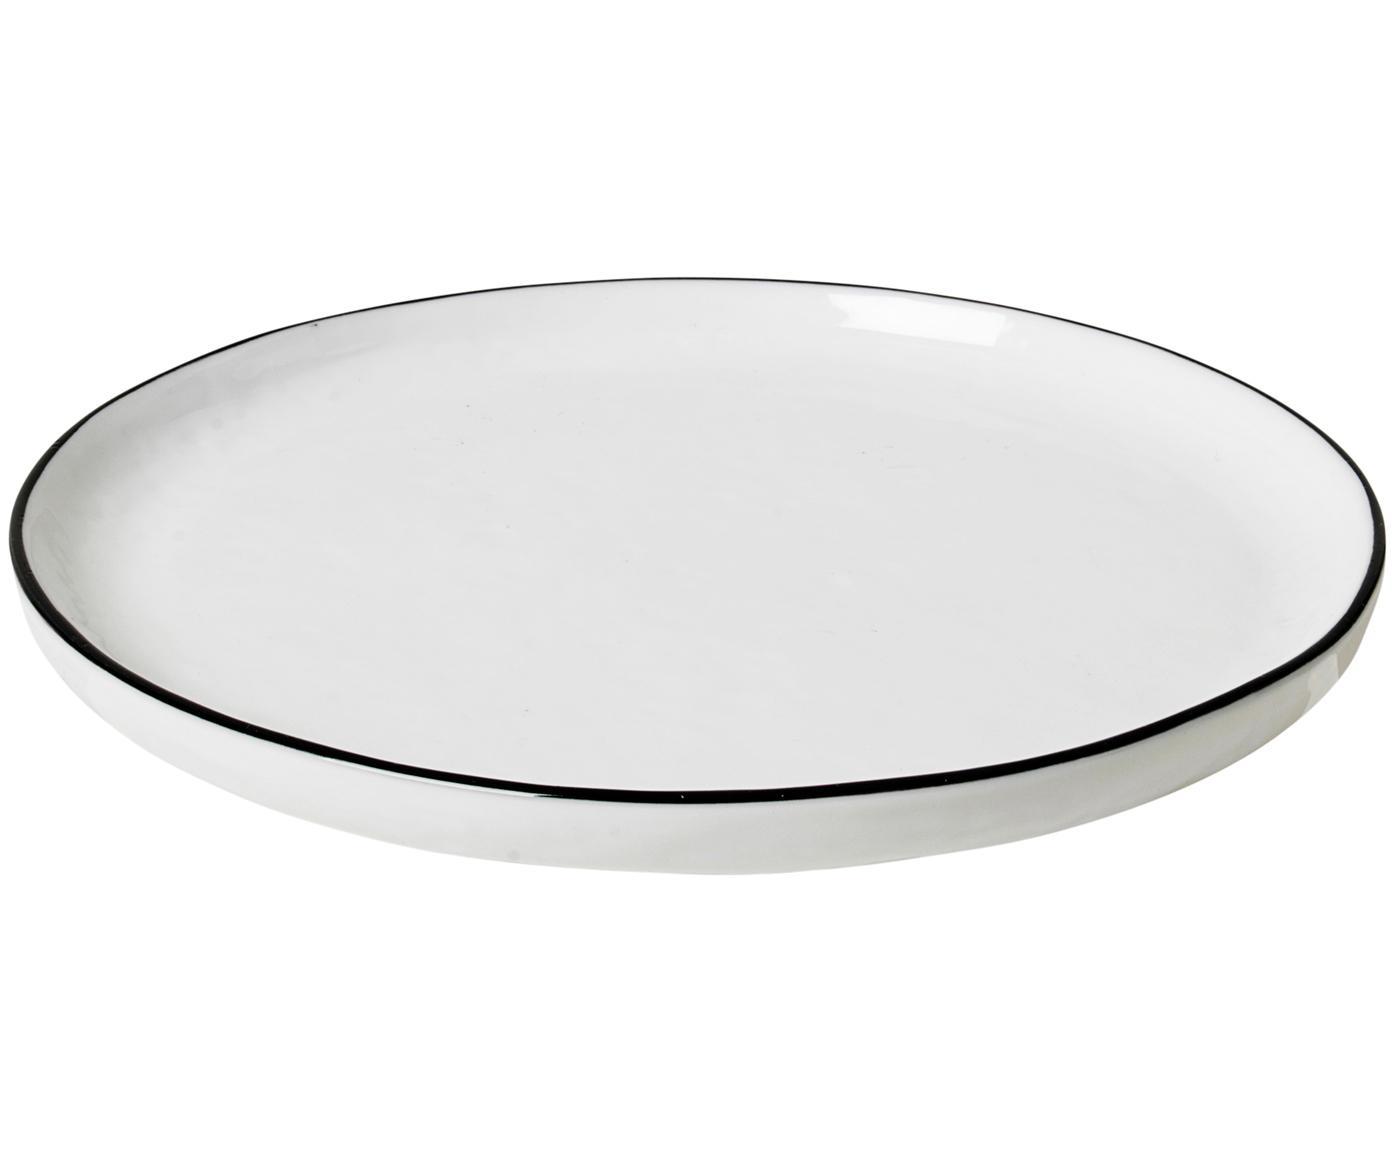 Piattino da dessert fatto a mano Salt 4 pz, Porcellana, Bianco latteo, nero, Ø 18 cm